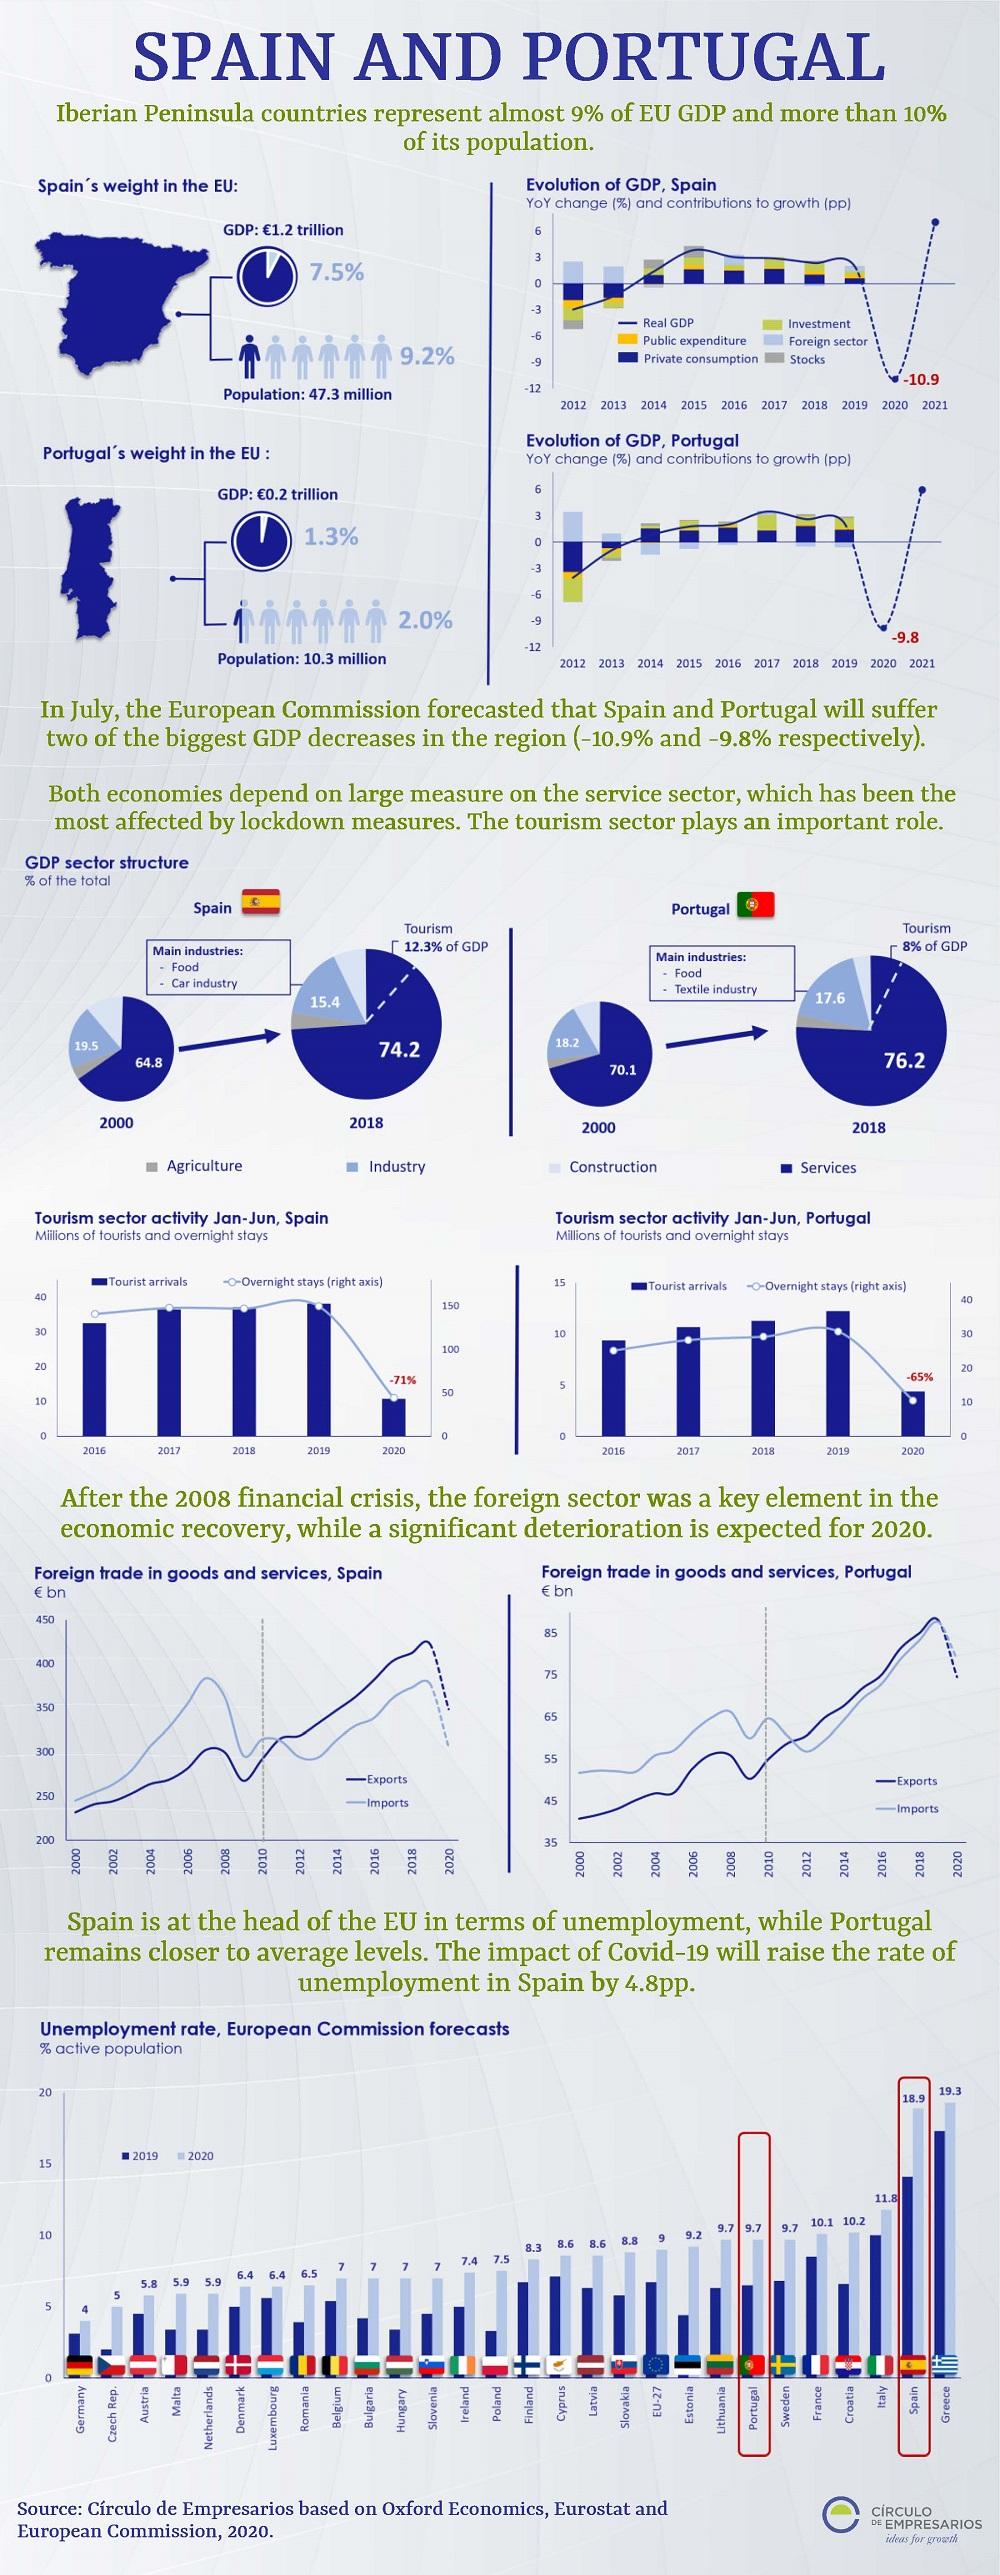 Spain-and-Portugal-infographic-August-2020-Circulo-de-Empresarios